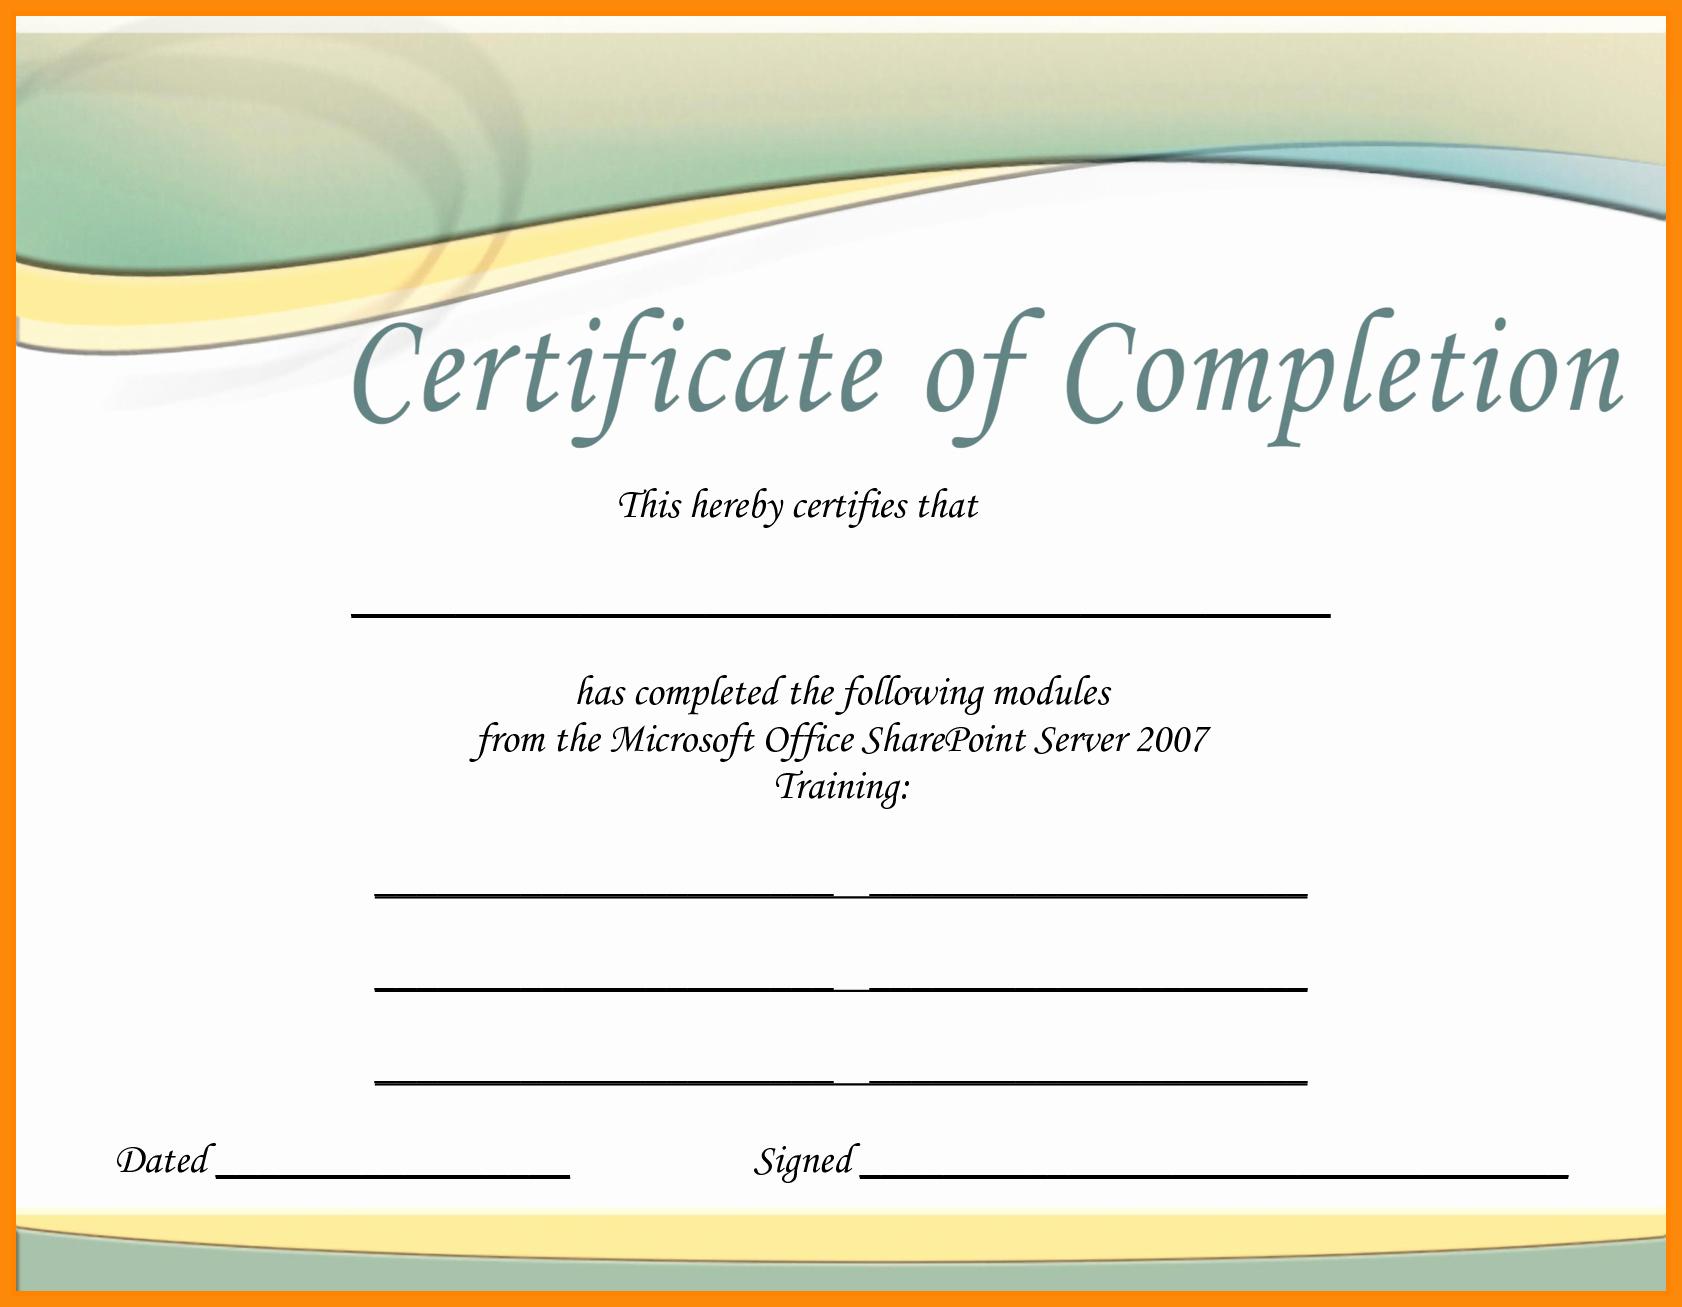 Award Certificate Template Microsoft Word Awesome Microsoft Award Templates Portablegasgrillweber